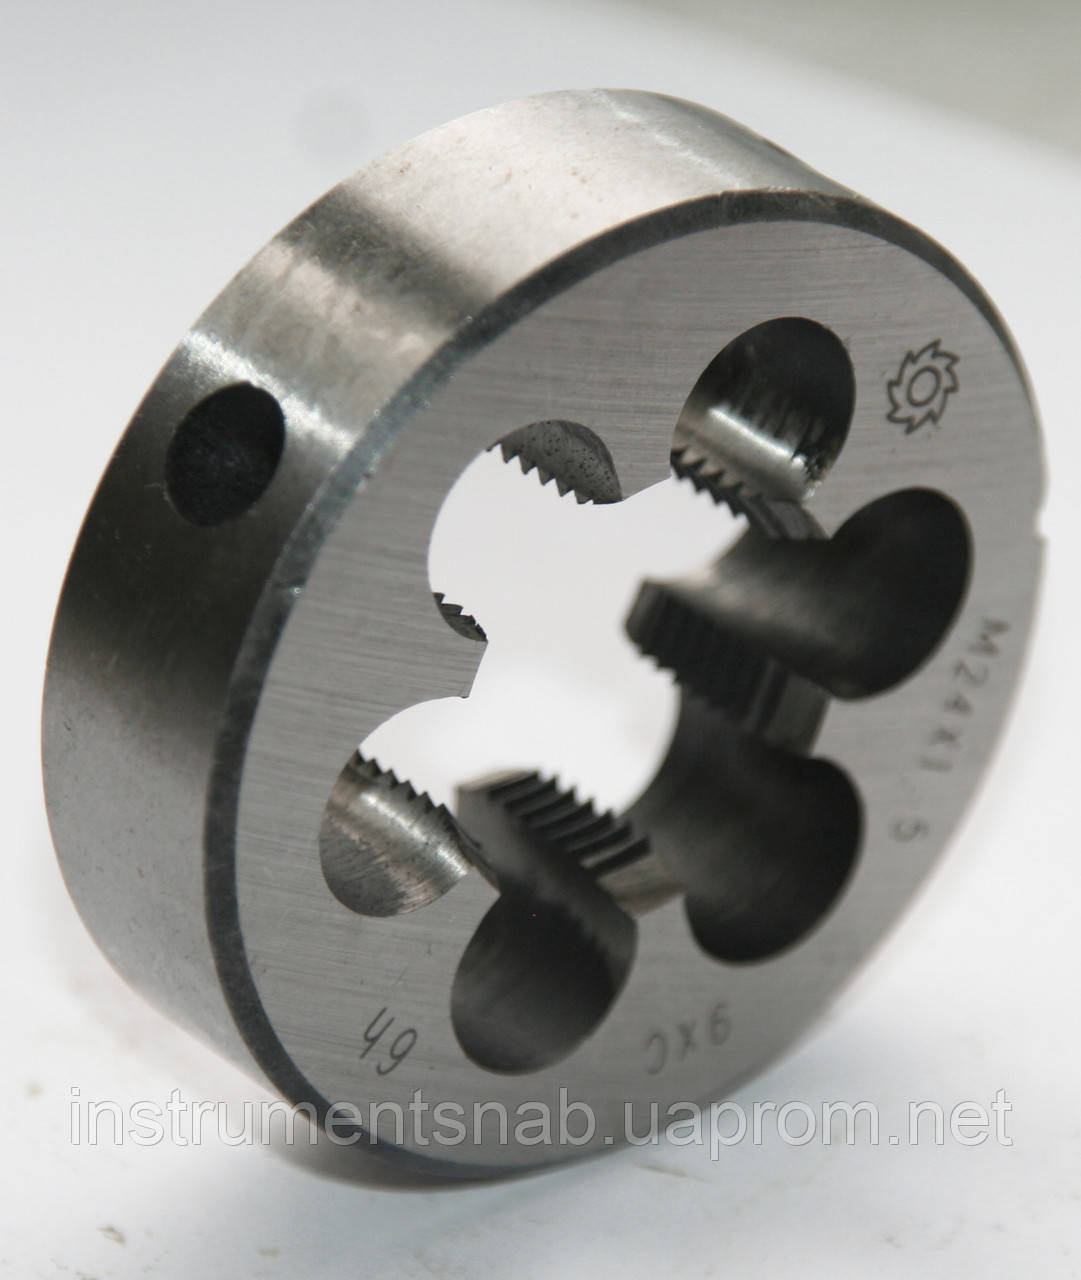 Плашка М-33х0,75, 9ХС, мелкий шаг